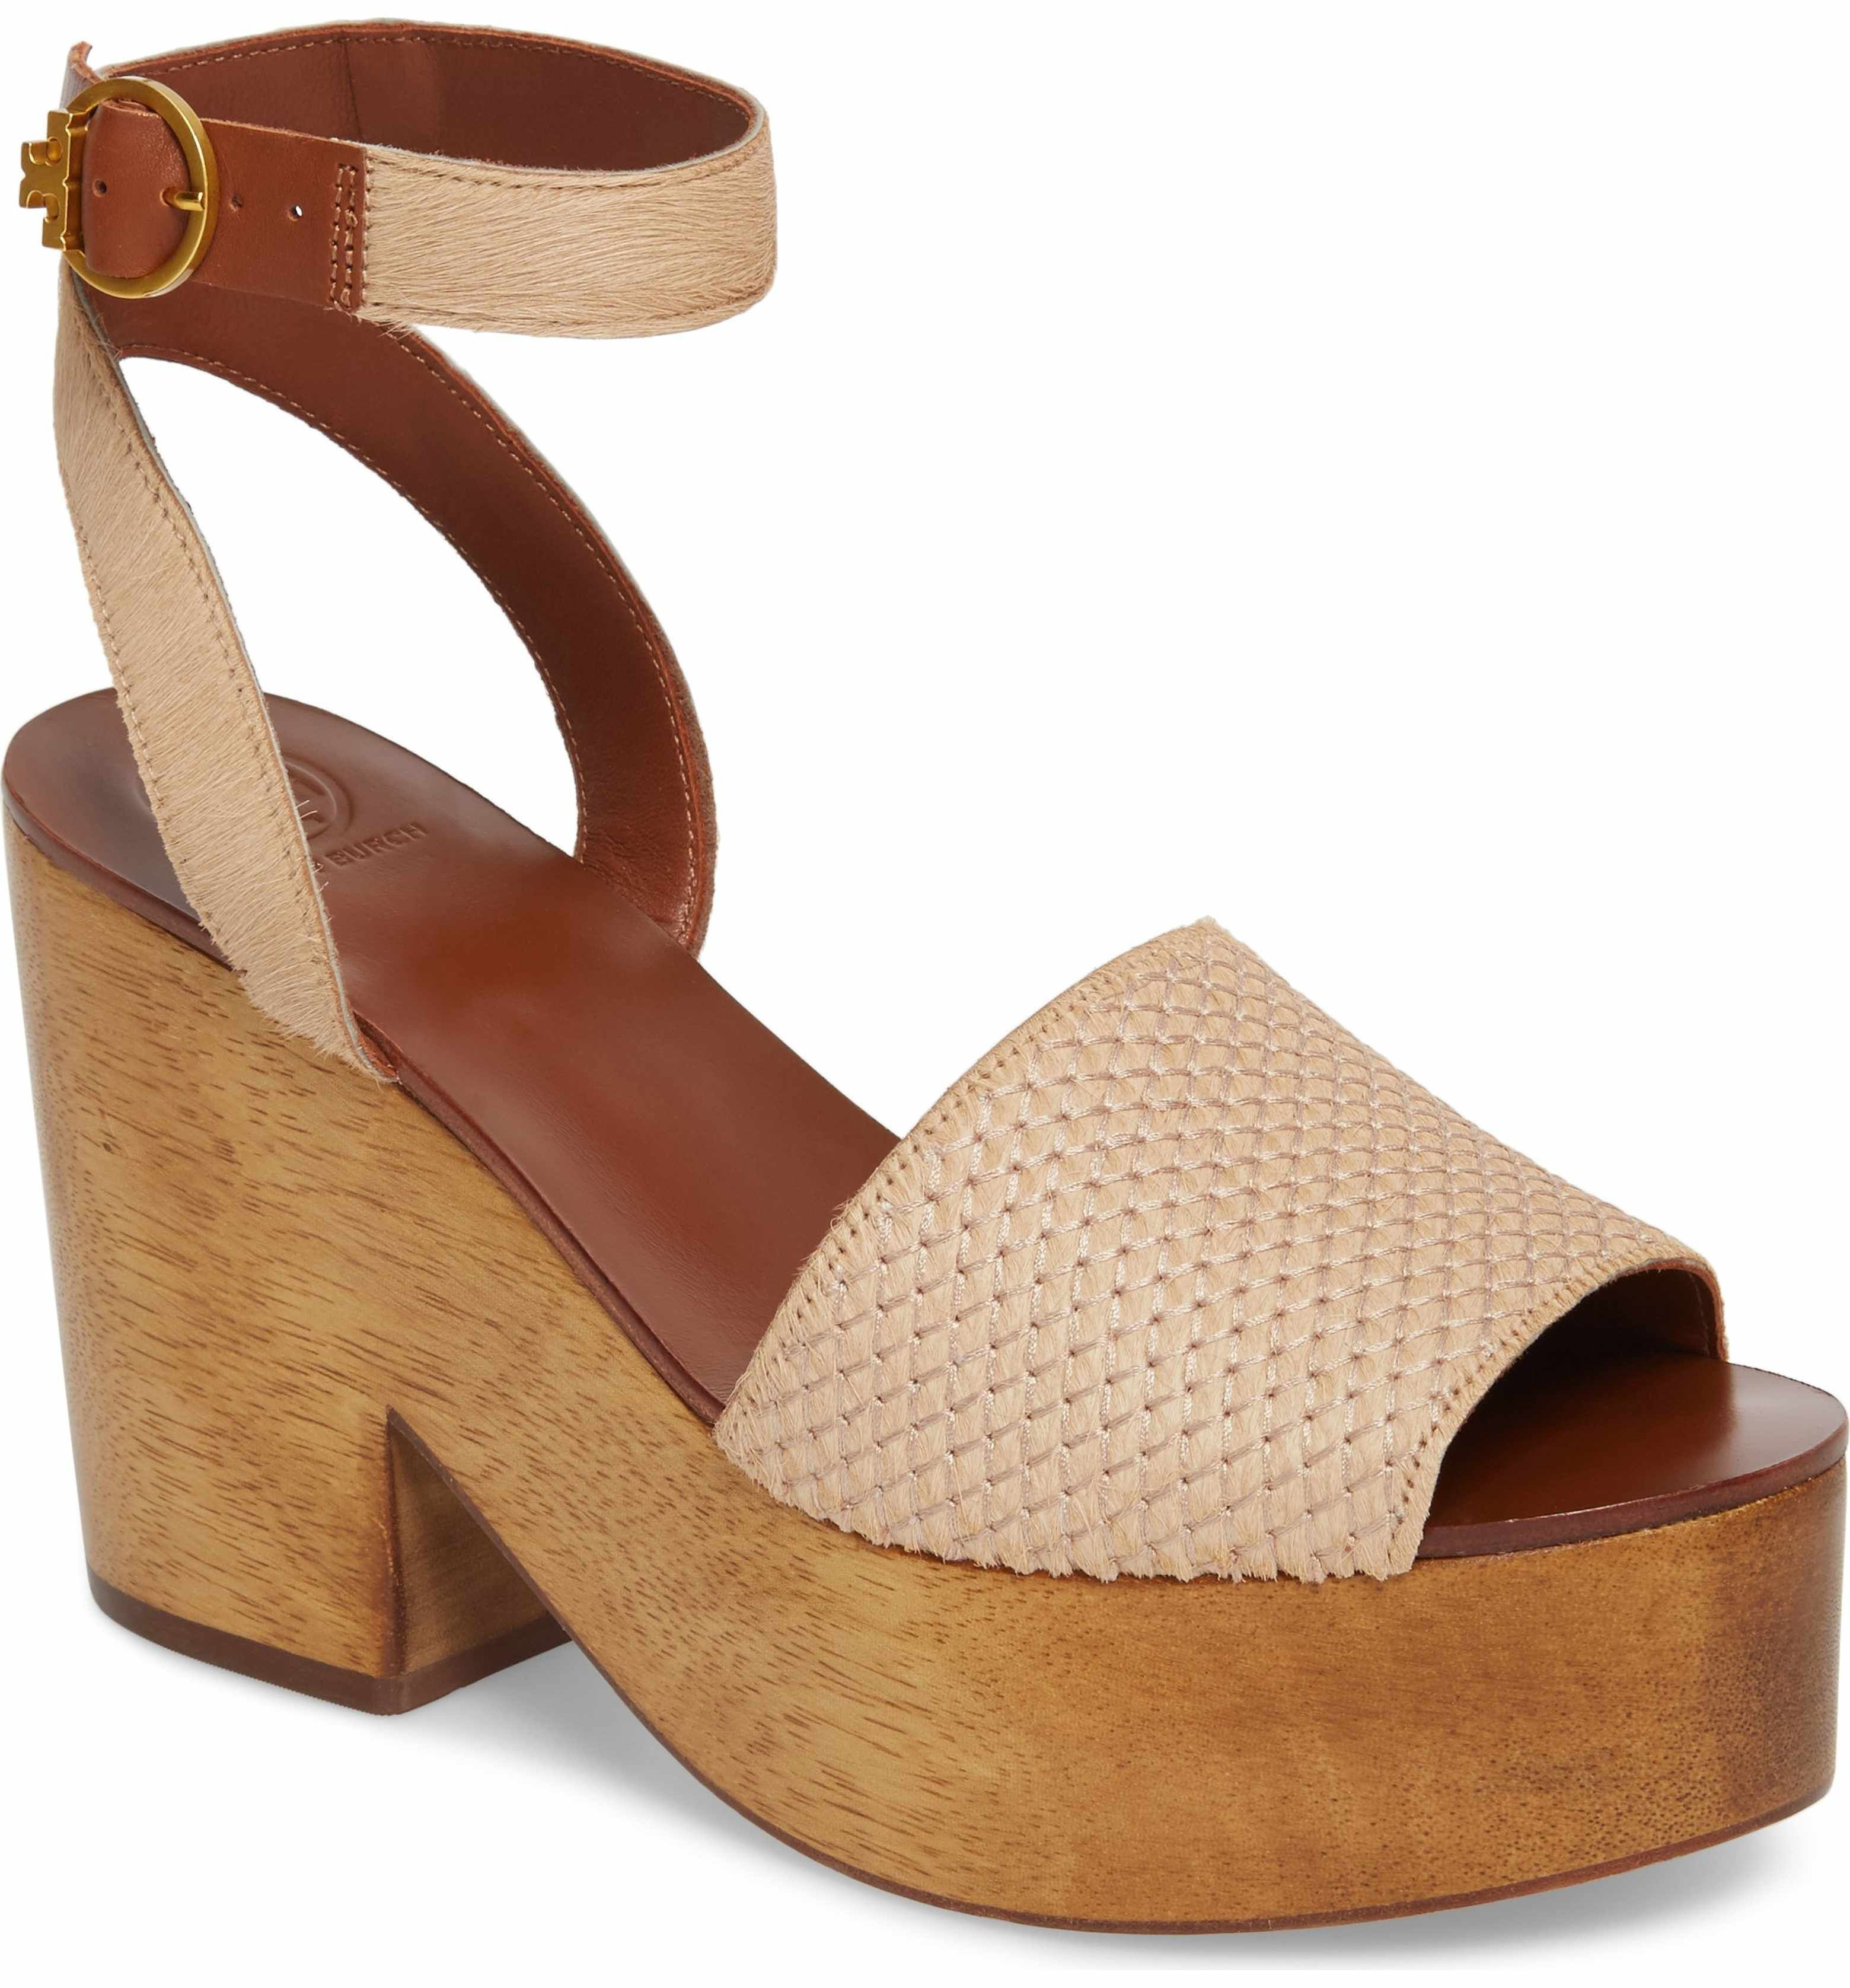 75046226ebf5 Main Image - Tory Burch Camilla Genuine Calf Hair Platform Sandal (Women)